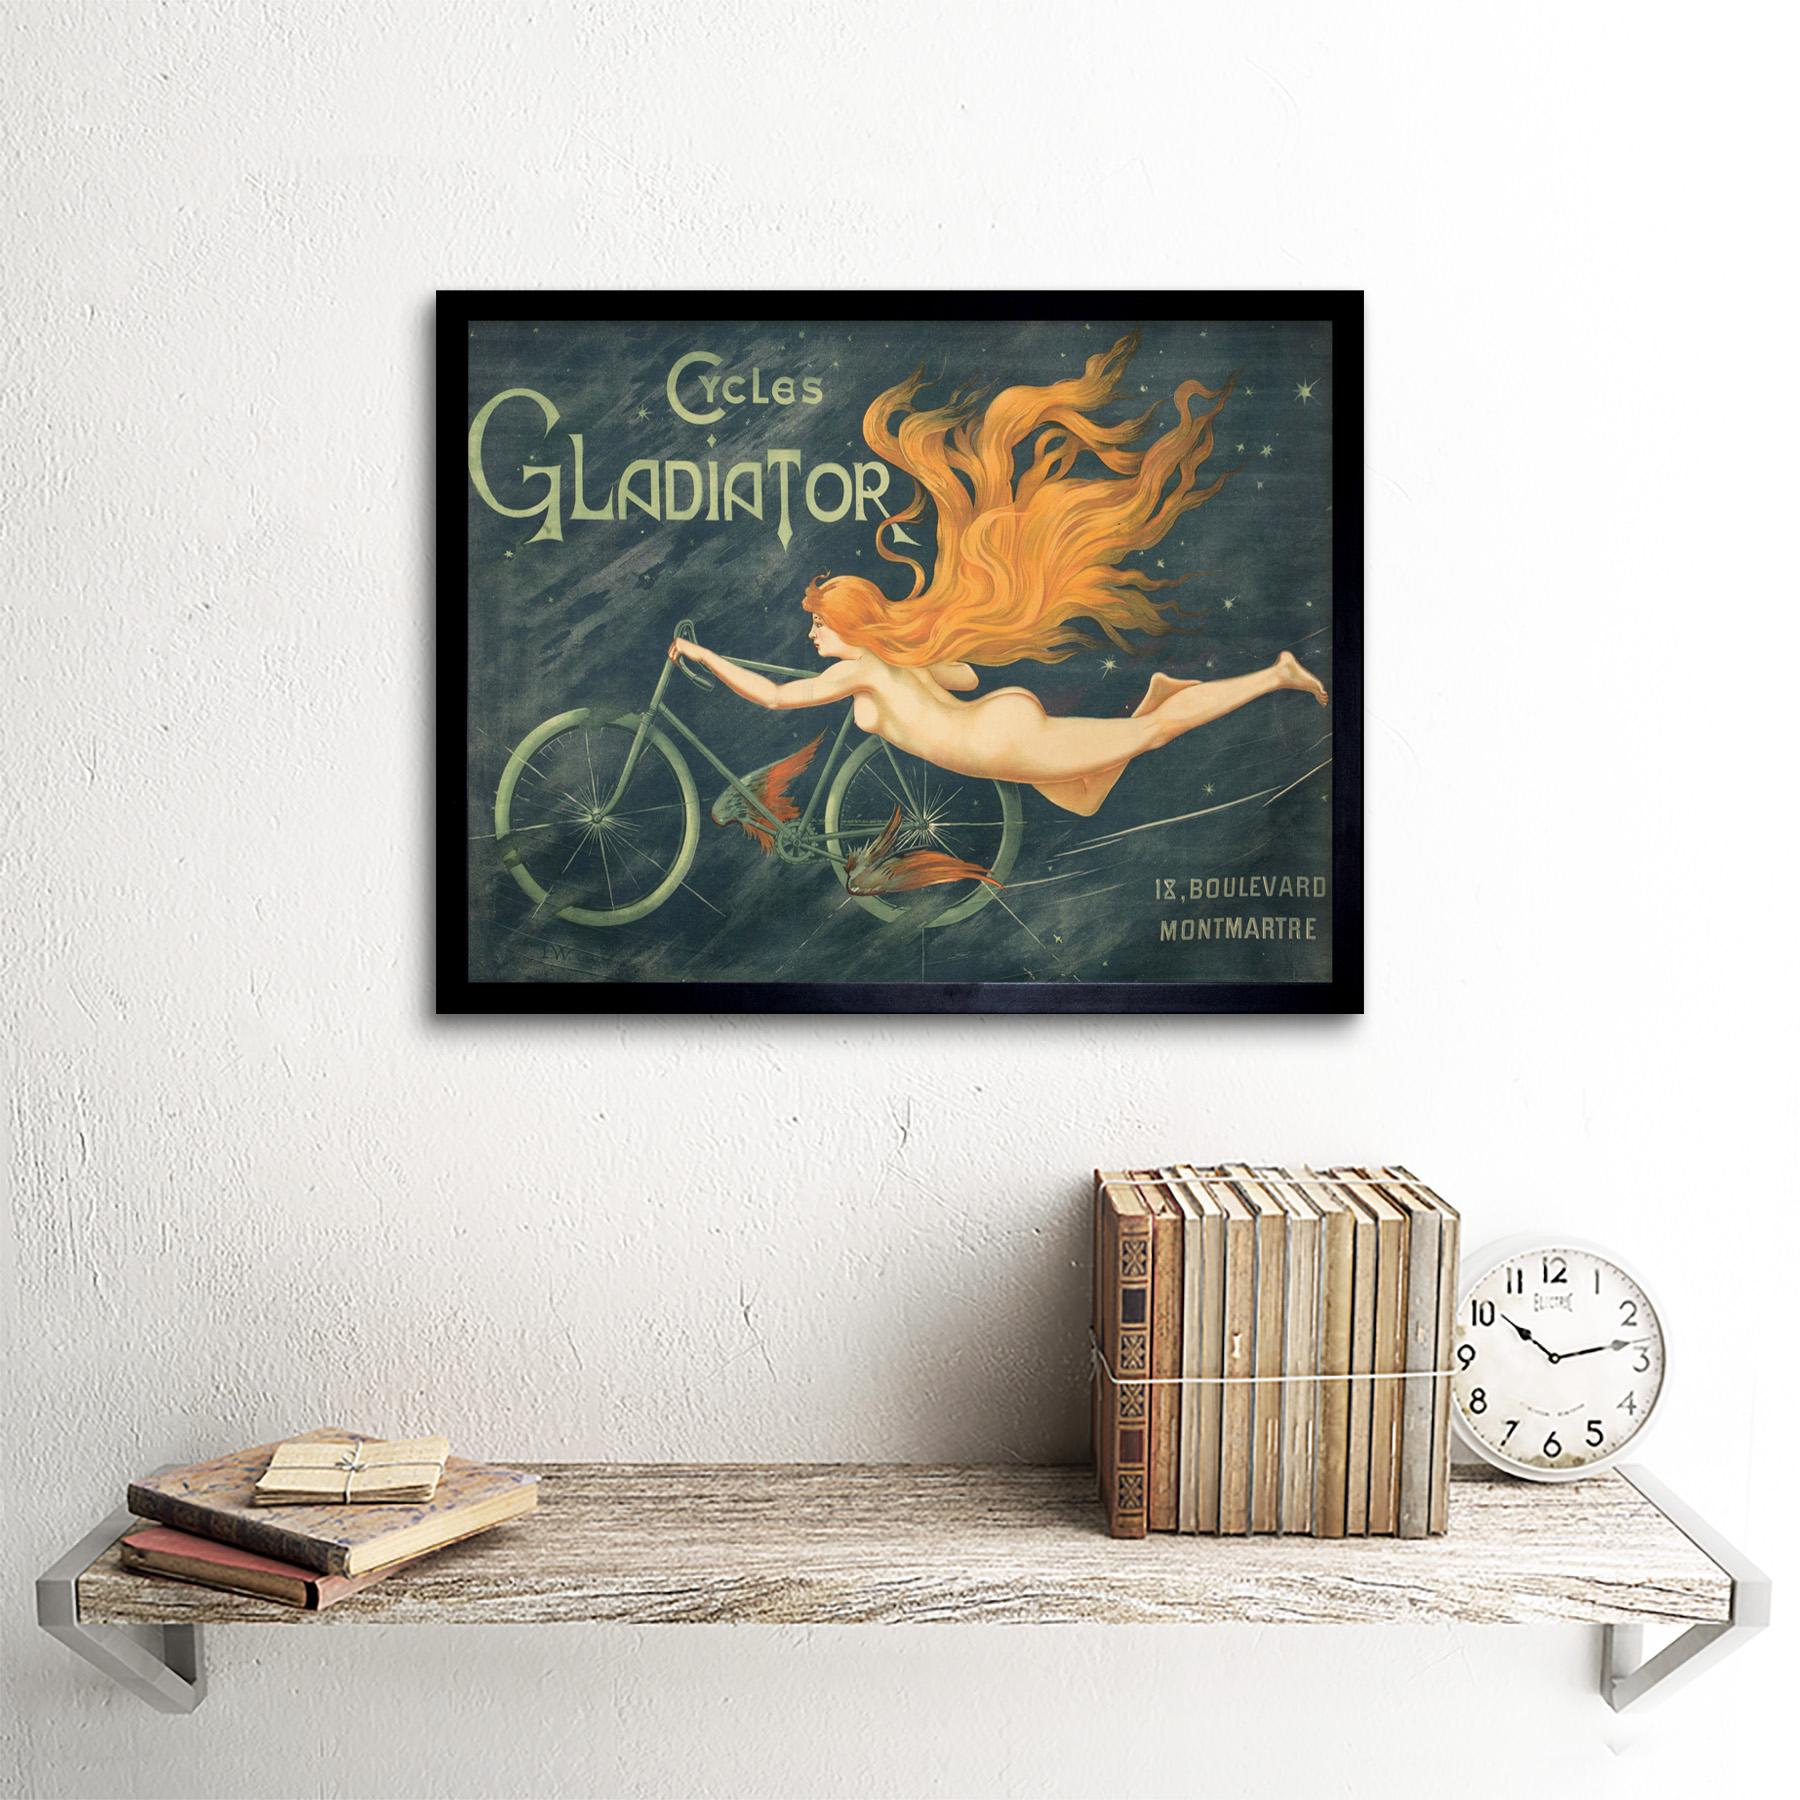 Massias Gladiator Cycles Bike Nude Woman Vintage Advert Art Print Framed 12x16